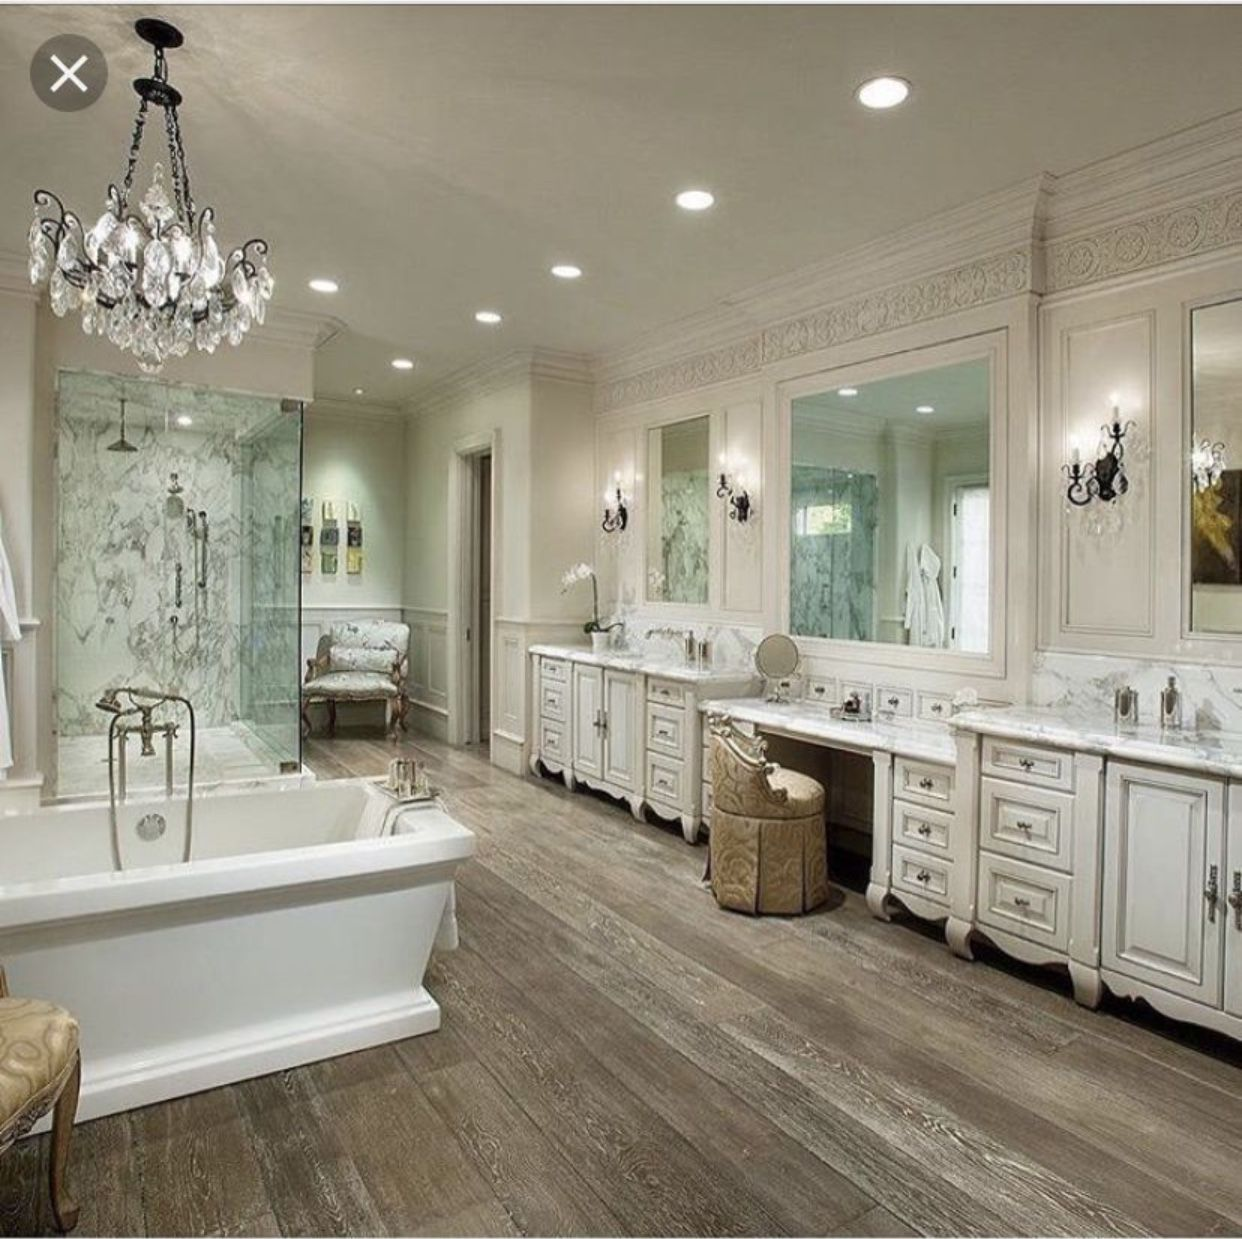 Pin By Doug Wilson On Houses Room Set Ups Big Bathrooms Dream Bathrooms Luxury Homes